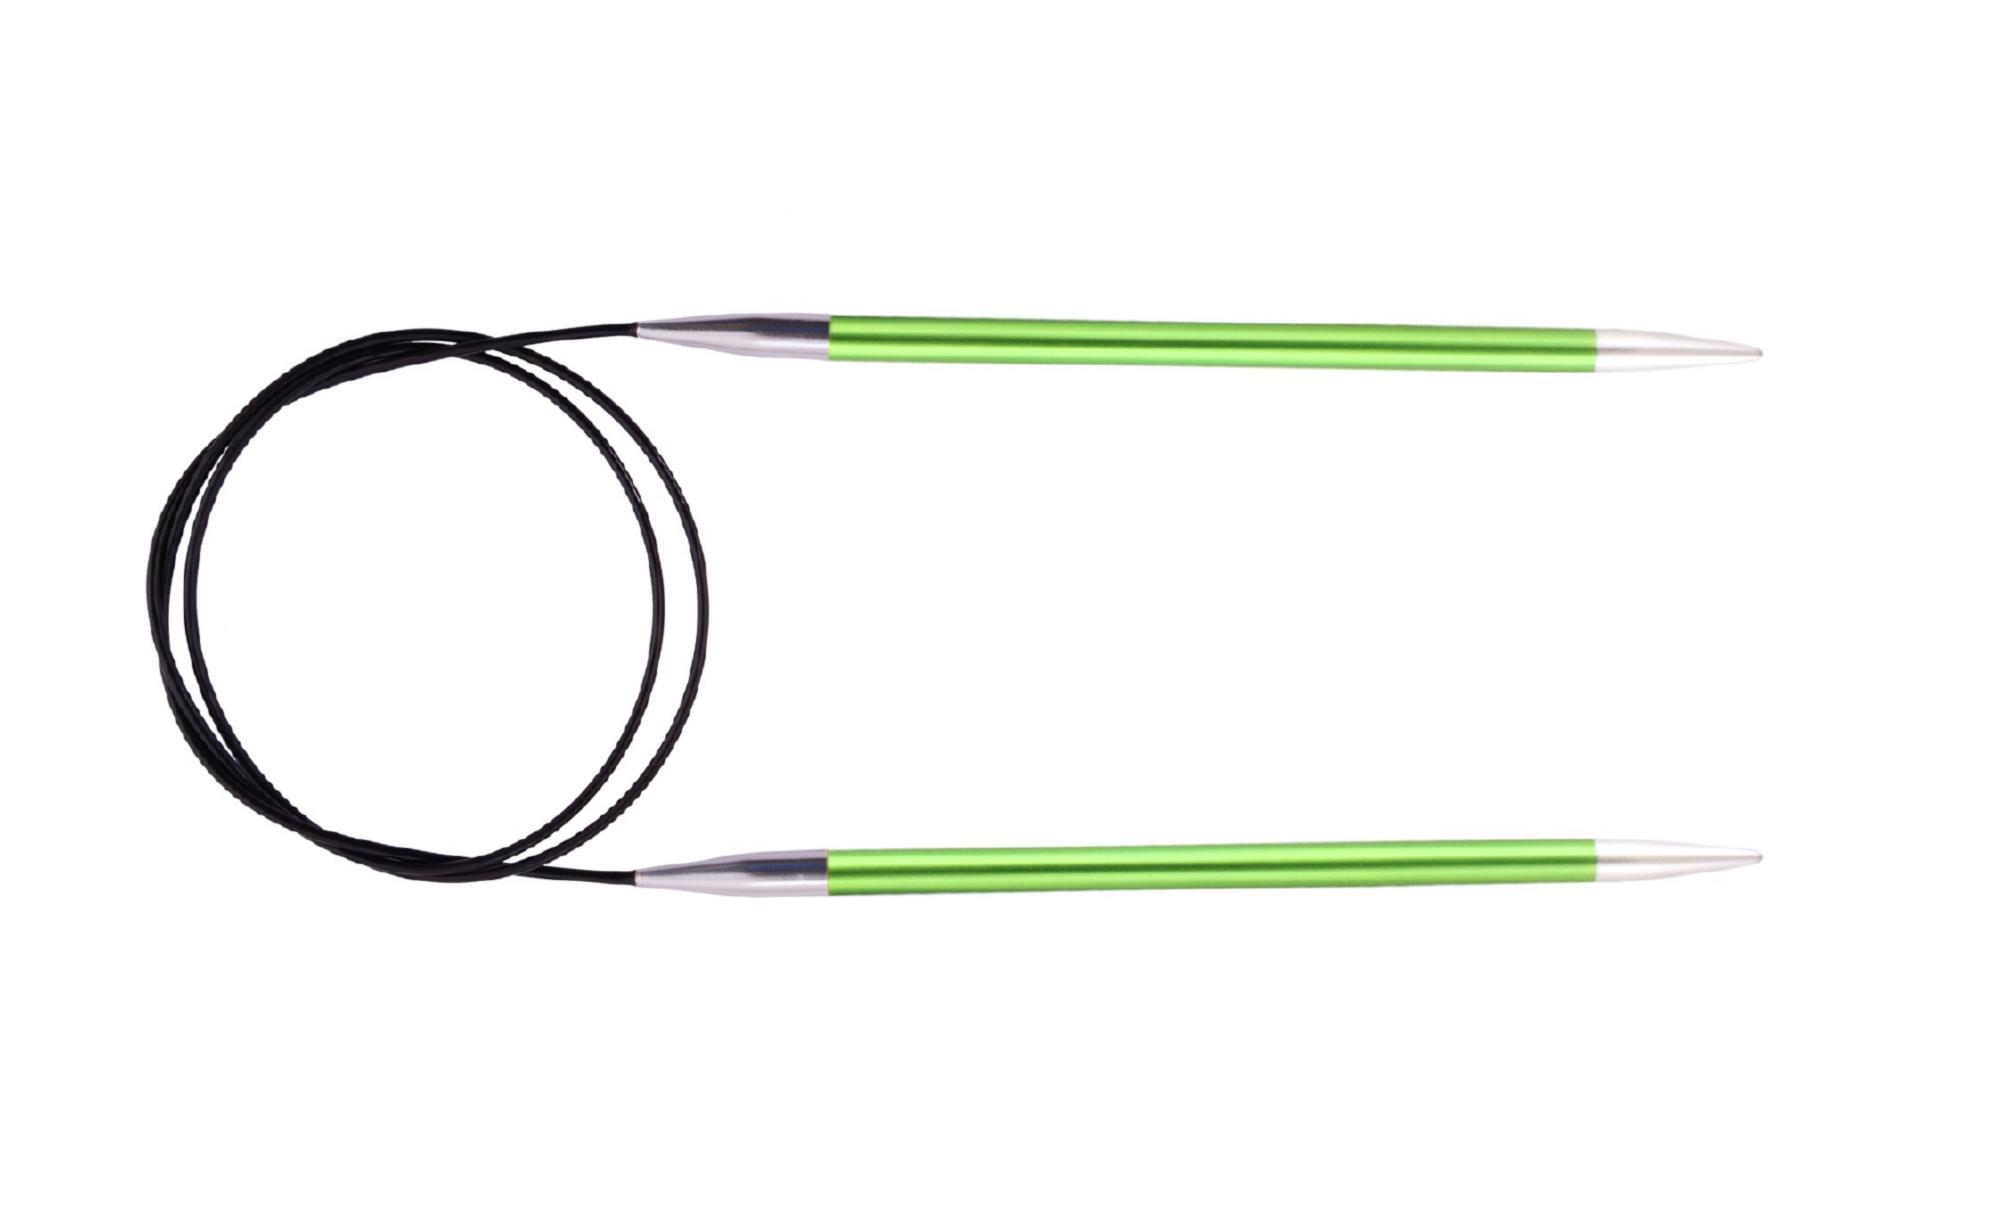 Спицы круговые 80 см Zing KnitPro, 47127, 3.50 мм